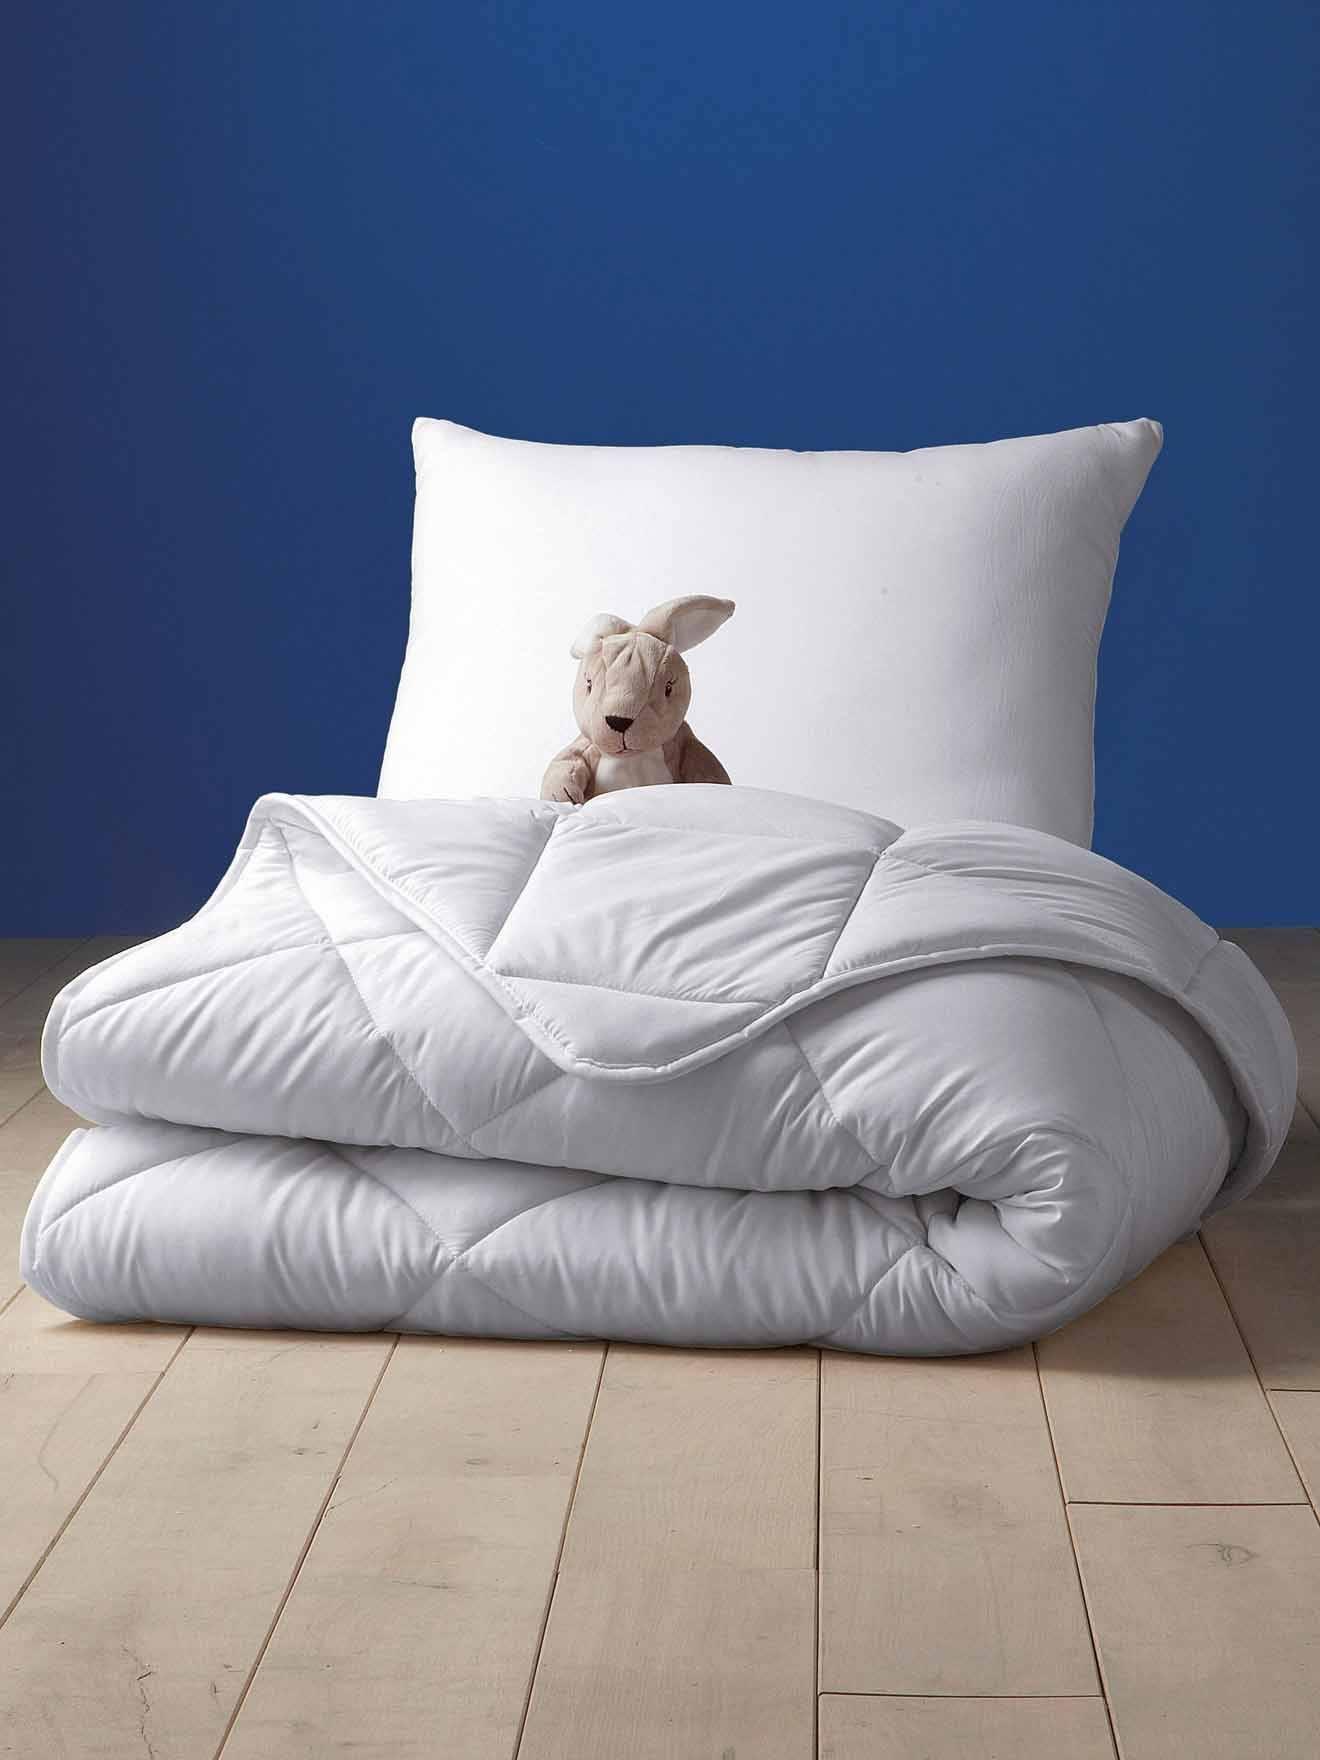 couette 4 saisons 140x200 affordable couettes saisons. Black Bedroom Furniture Sets. Home Design Ideas